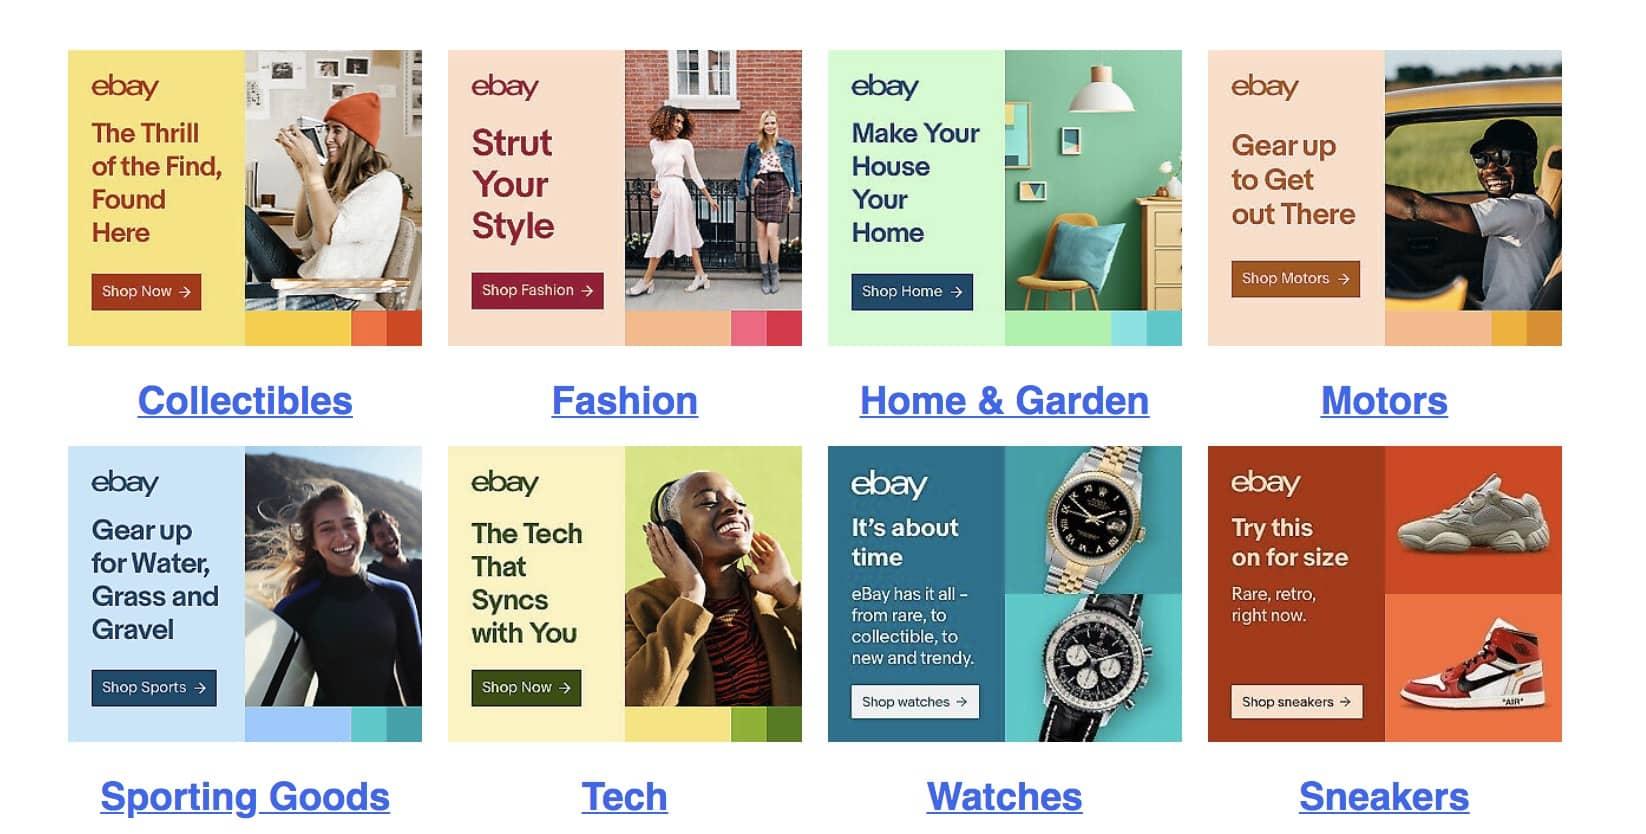 ebay banners